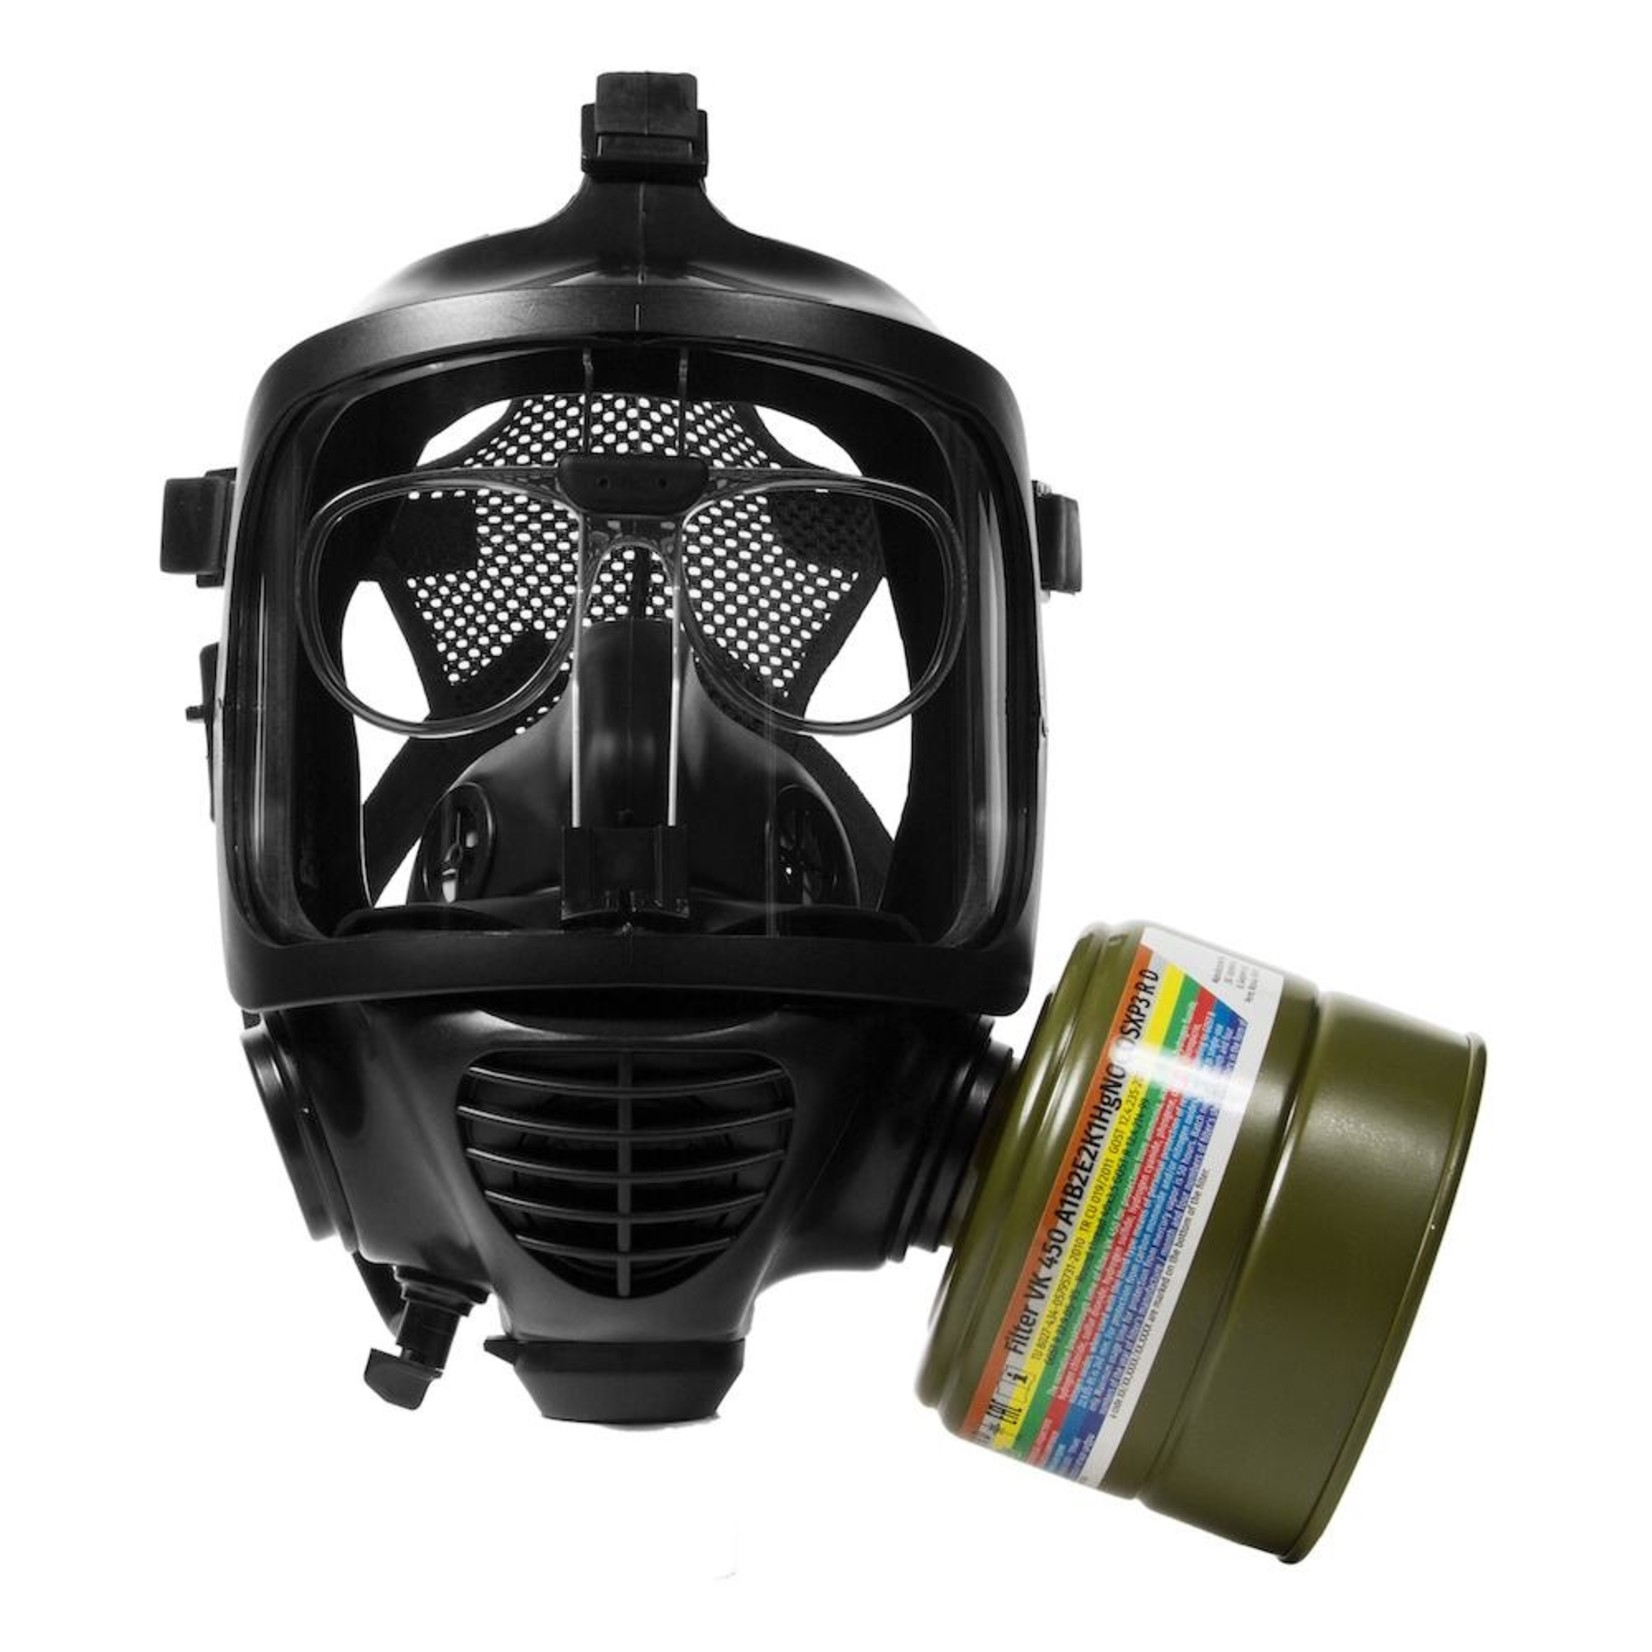 MIRA SAFETY VK-450 SMOKE / CARBON MONOXIDE FILTER CARTRIDGE